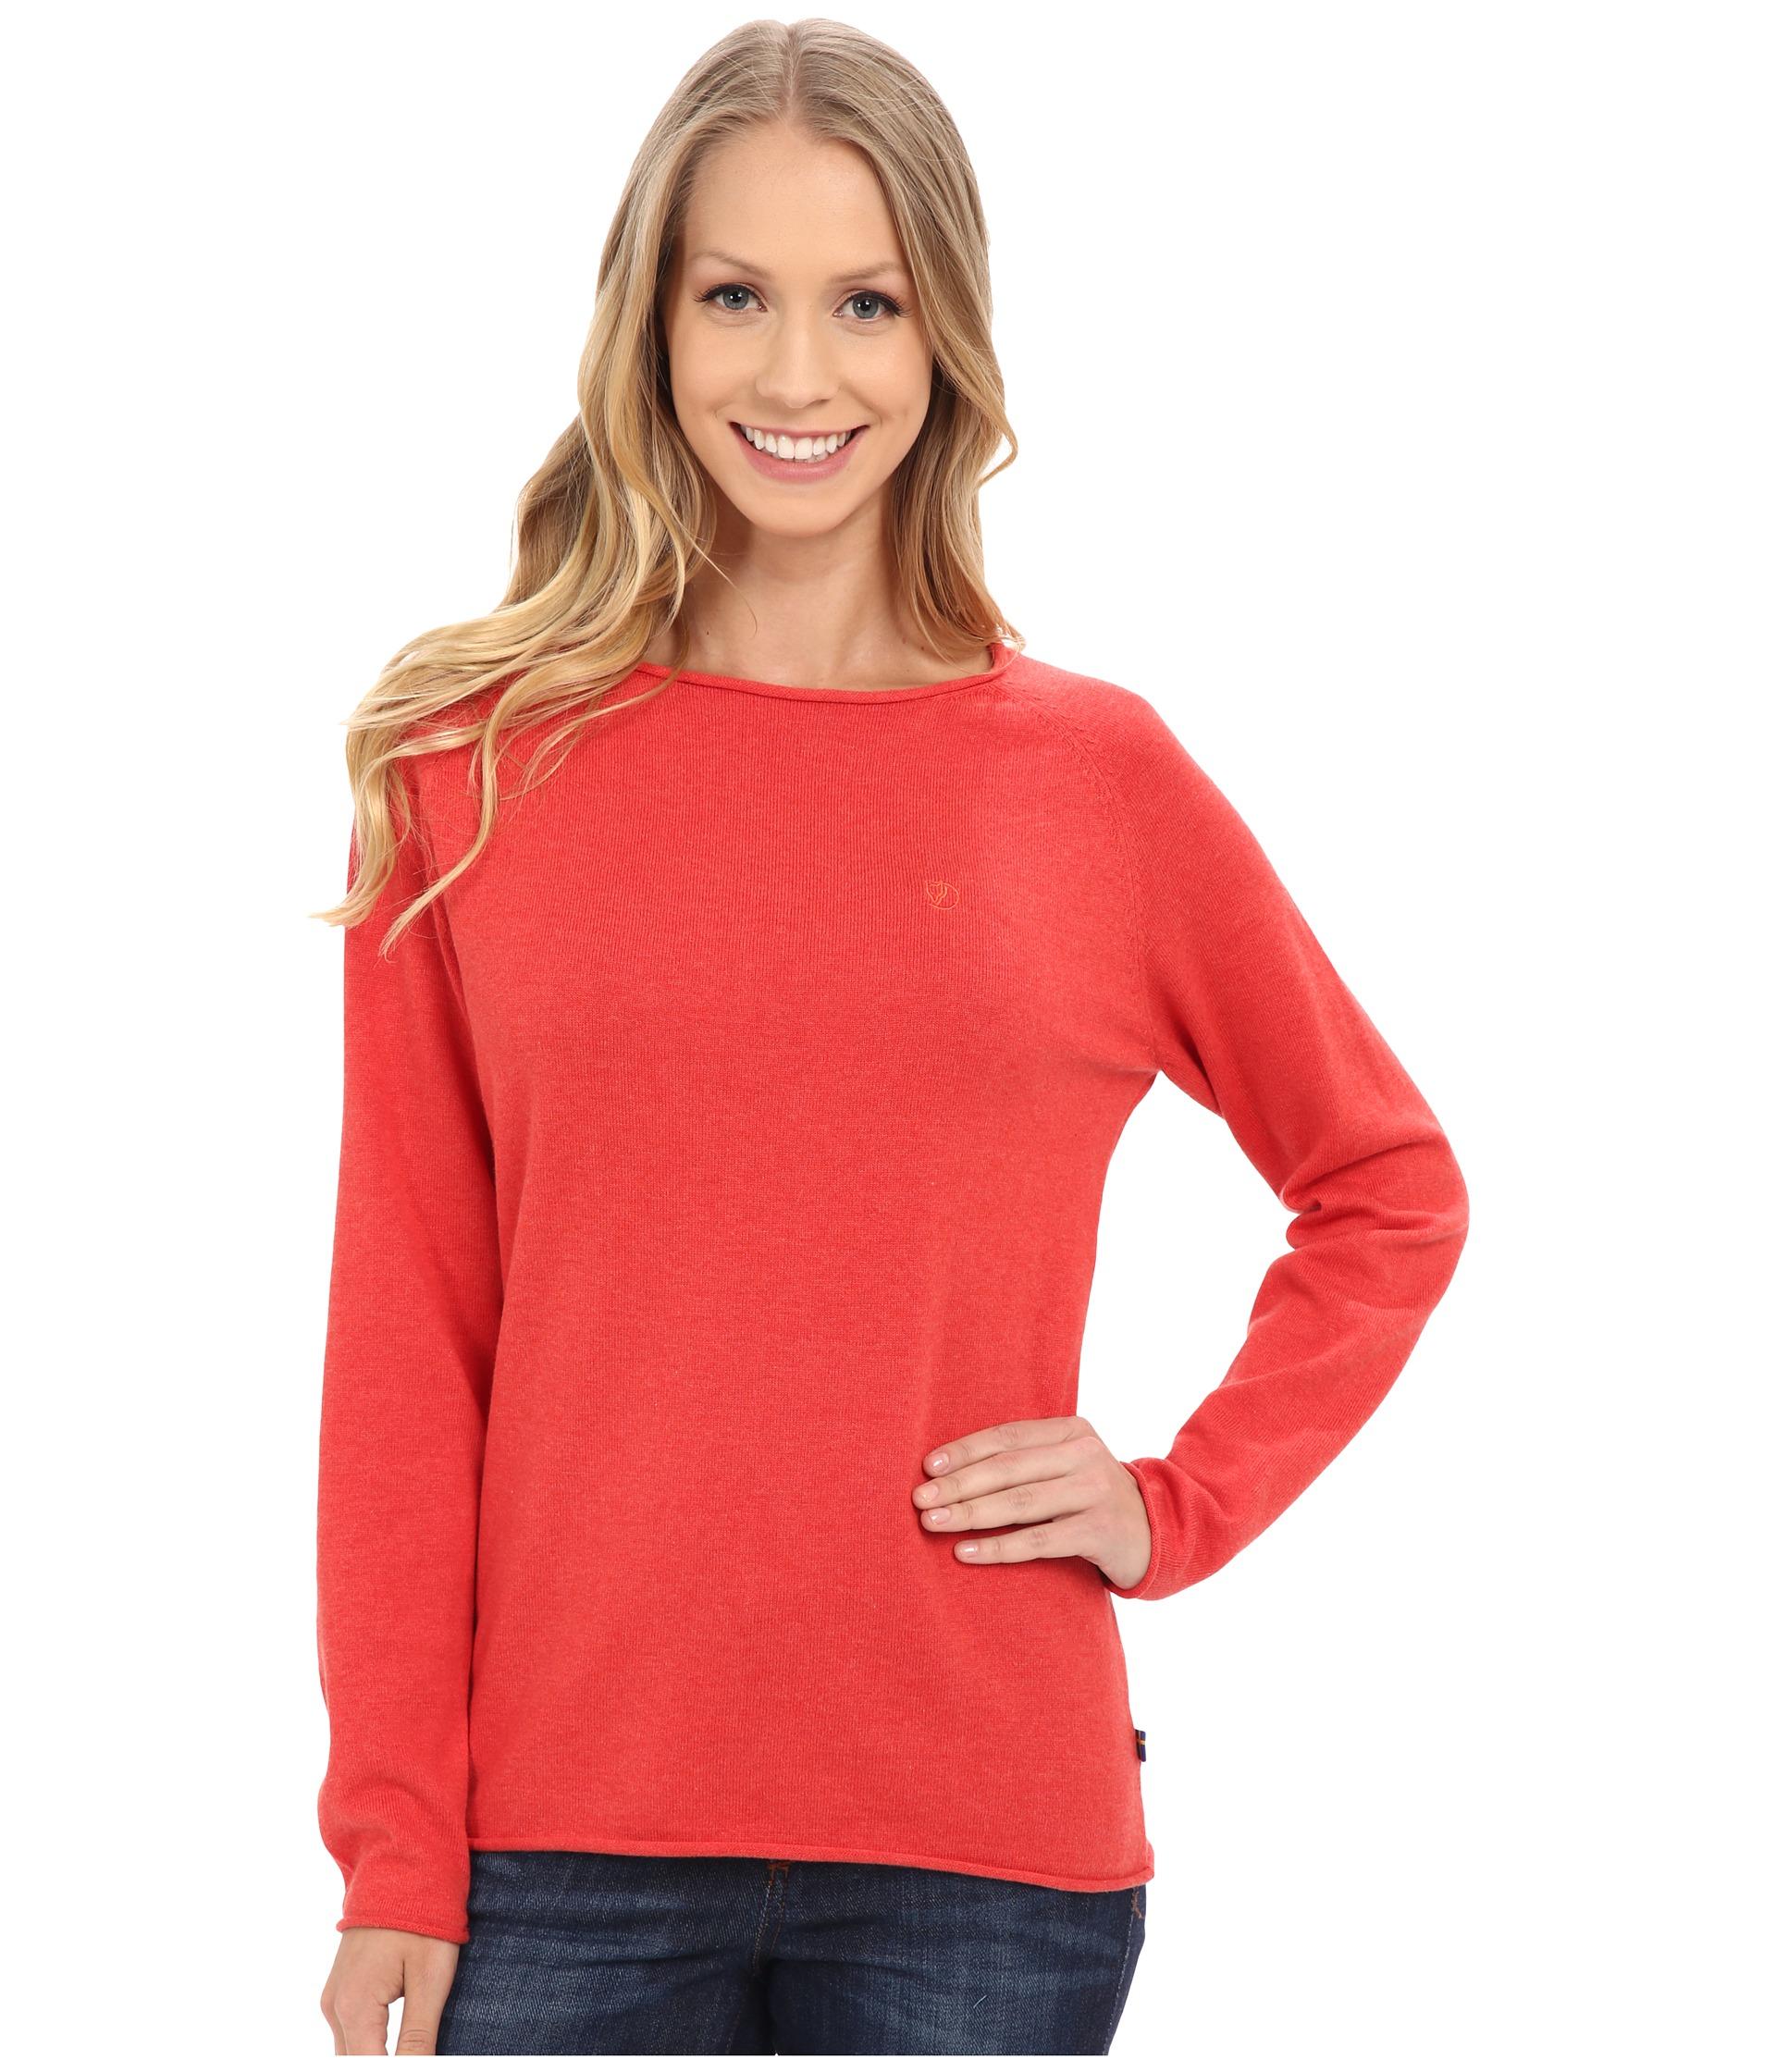 Fjallraven Övik Sweater in Pink | Lyst